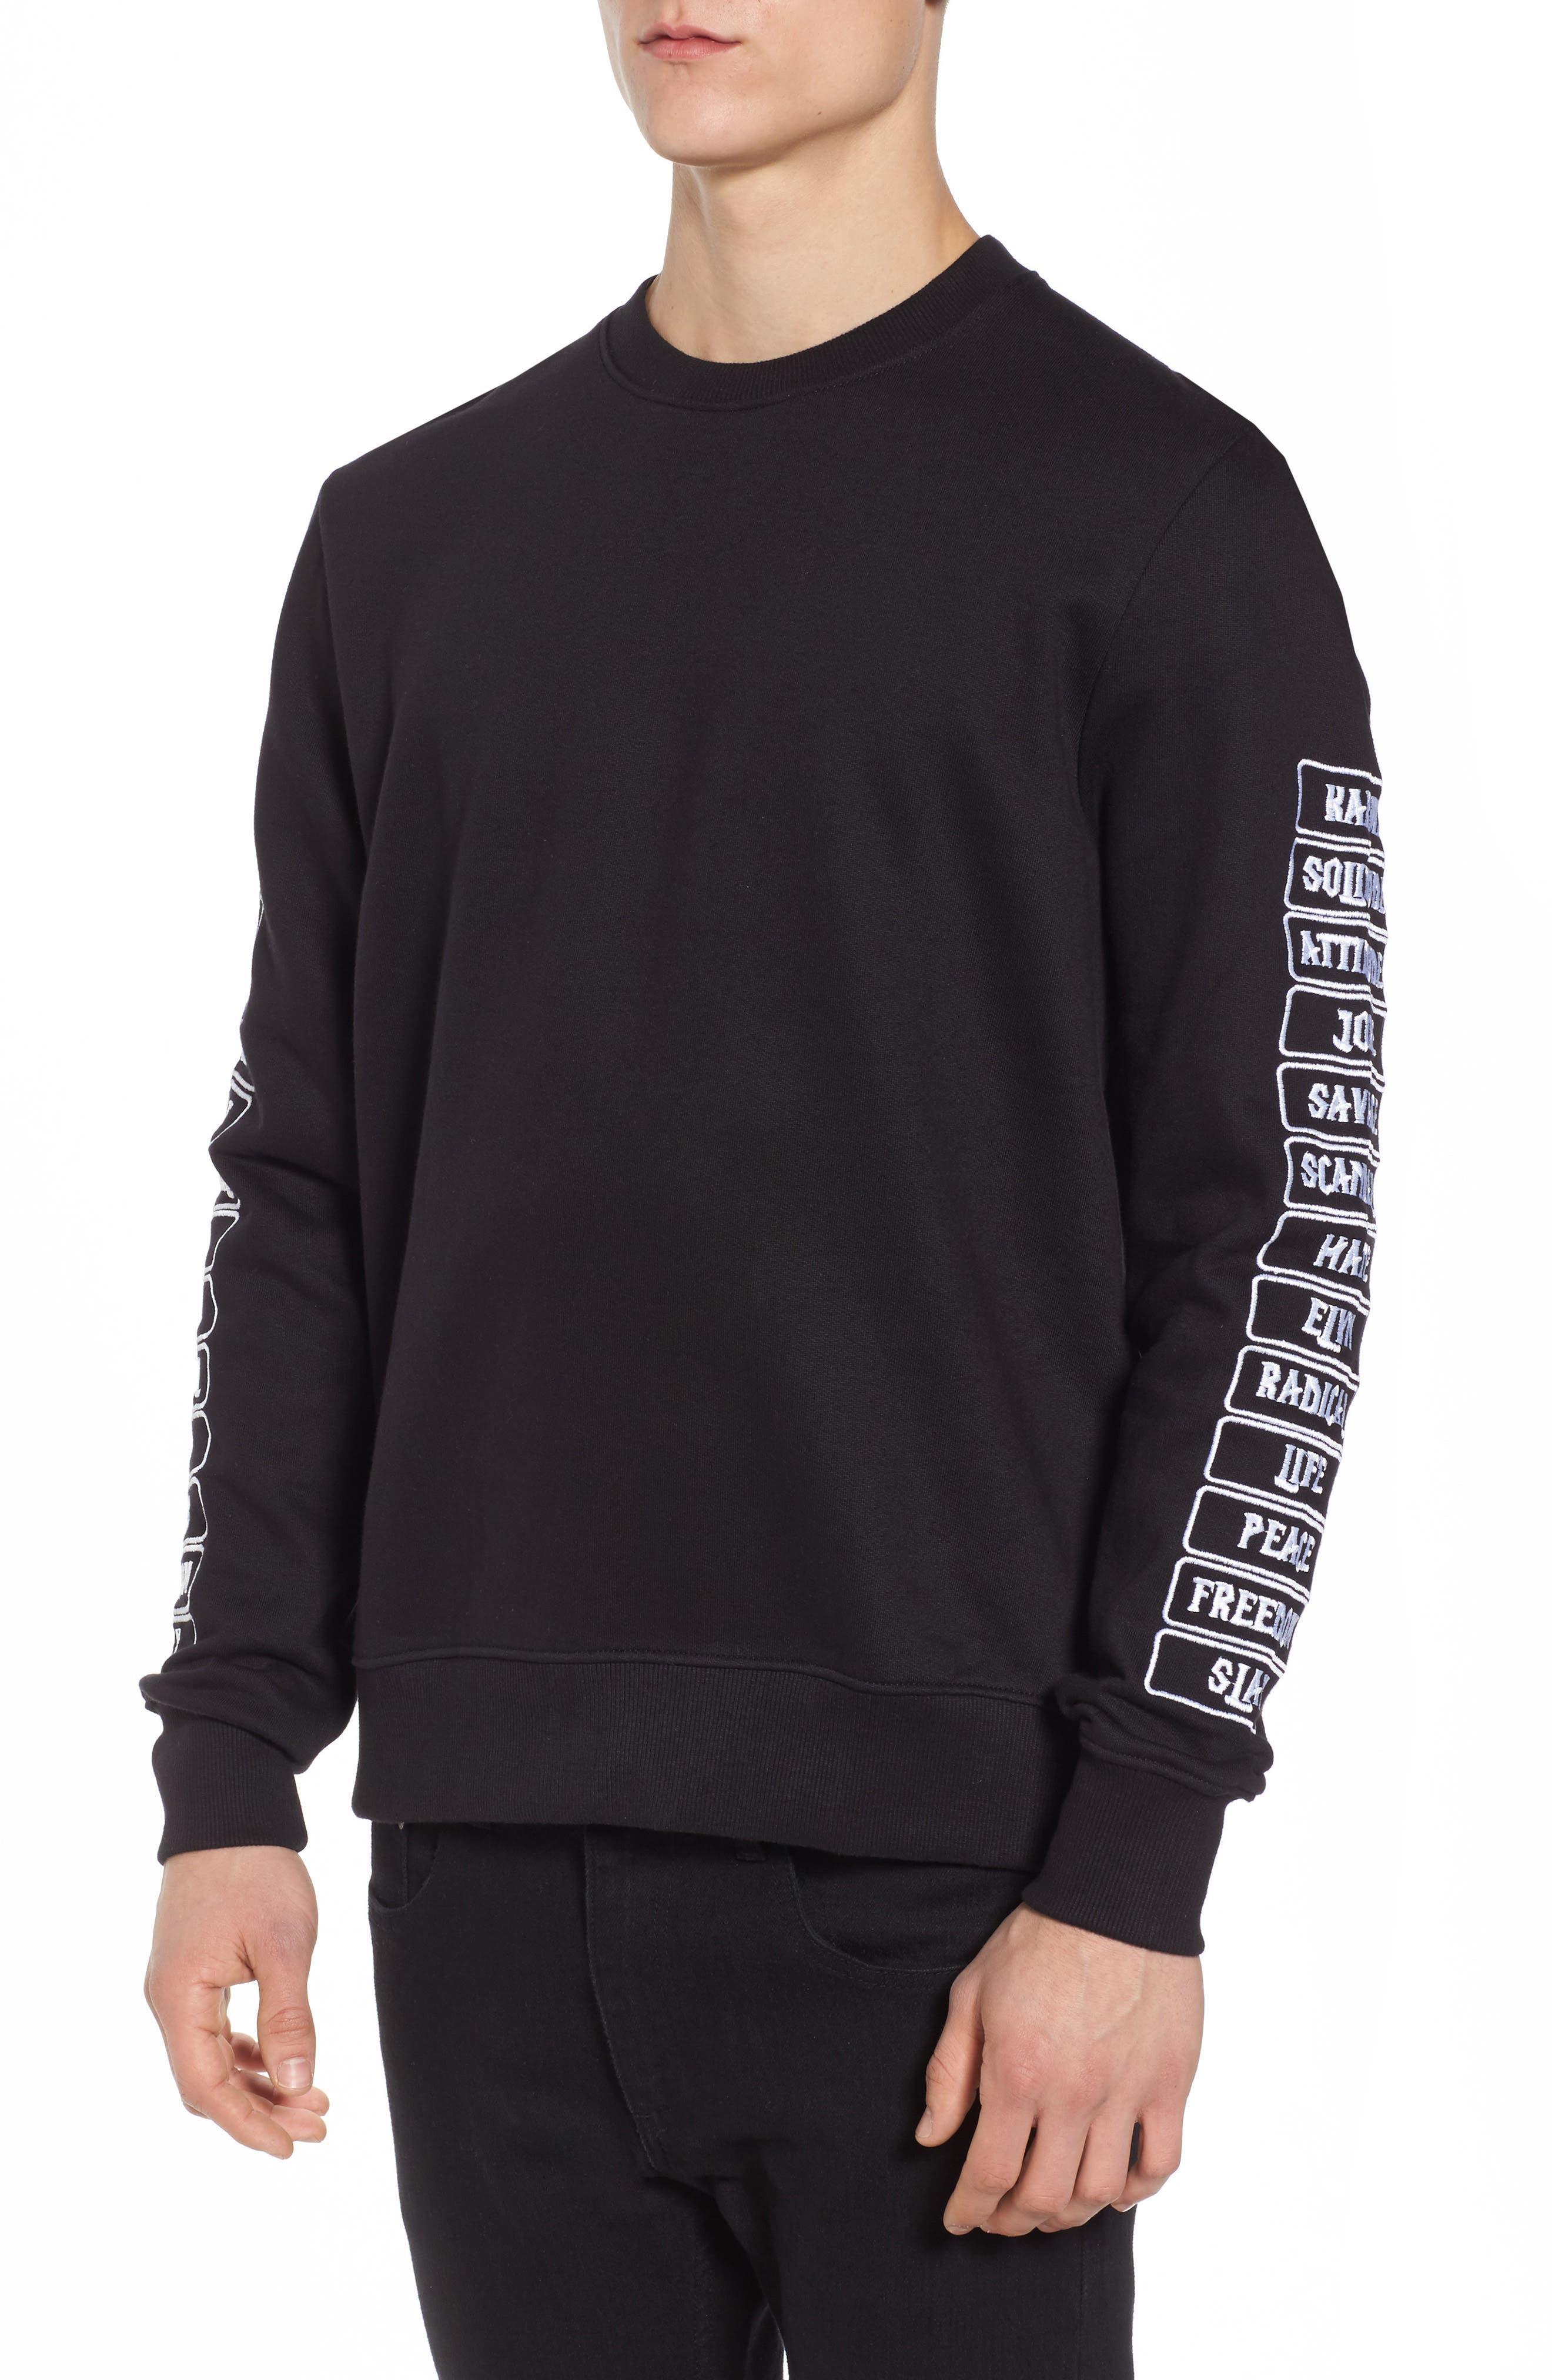 Meace Fleece Sweatshirt,                         Main,                         color, Black